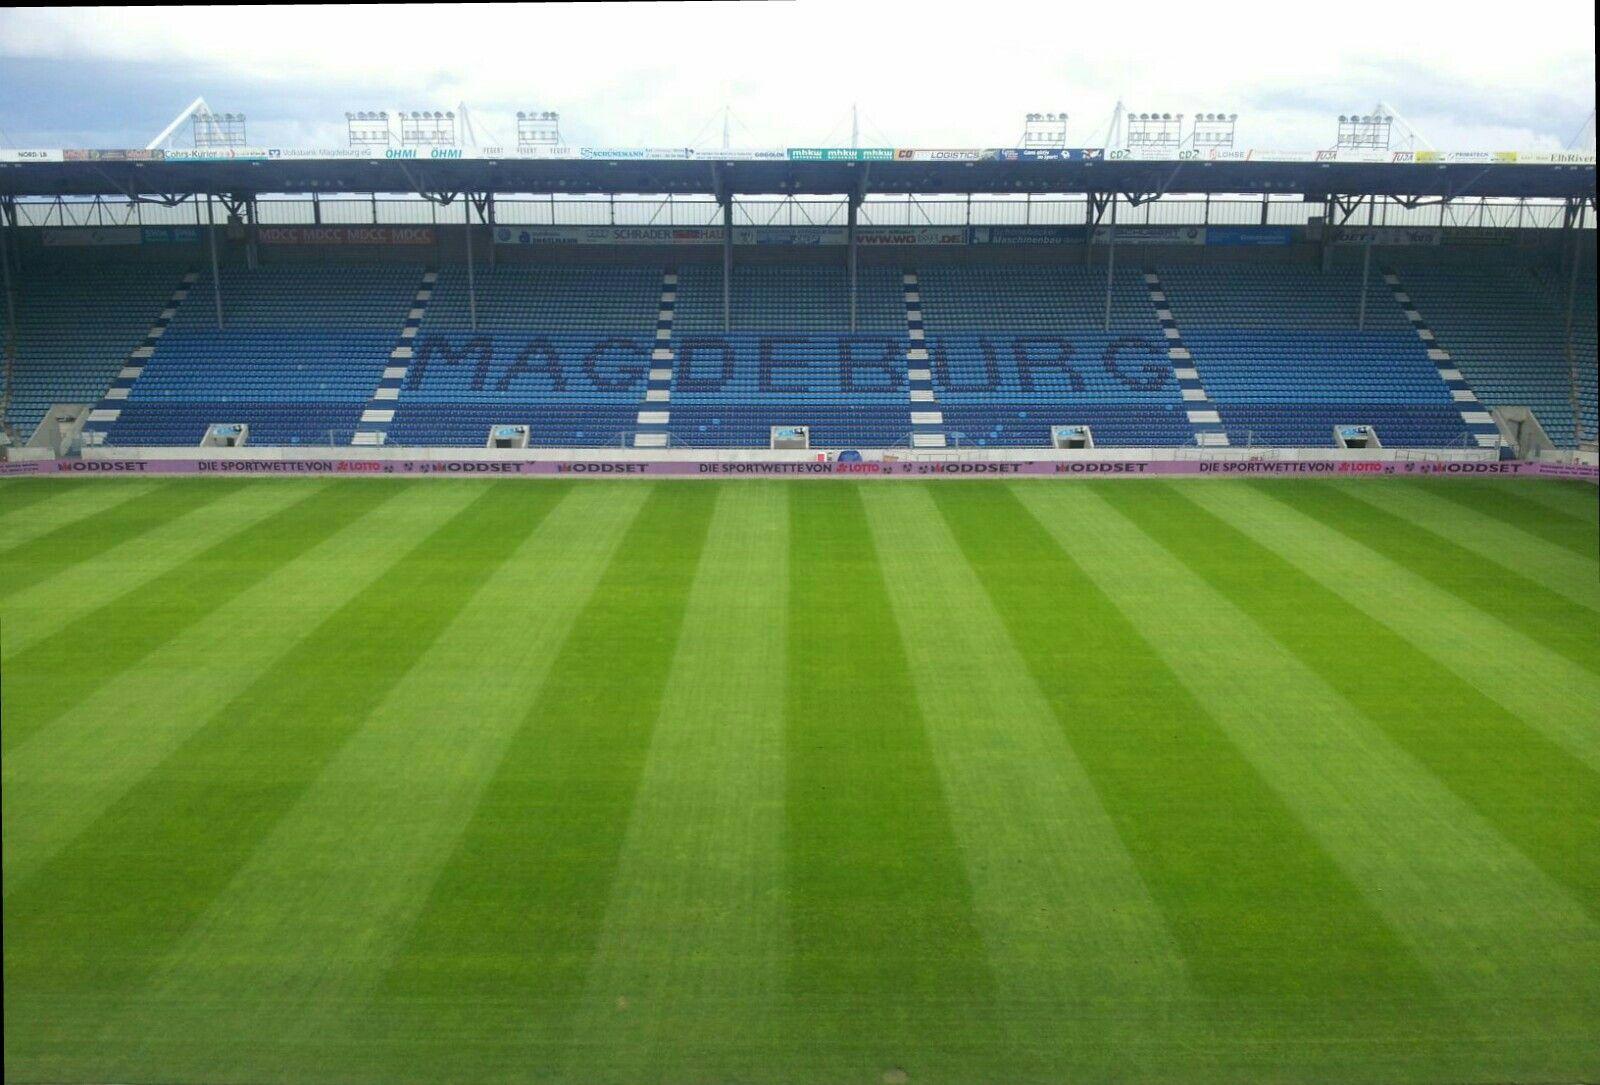 1. FC Magdeburg MDCC-ARENA FCM